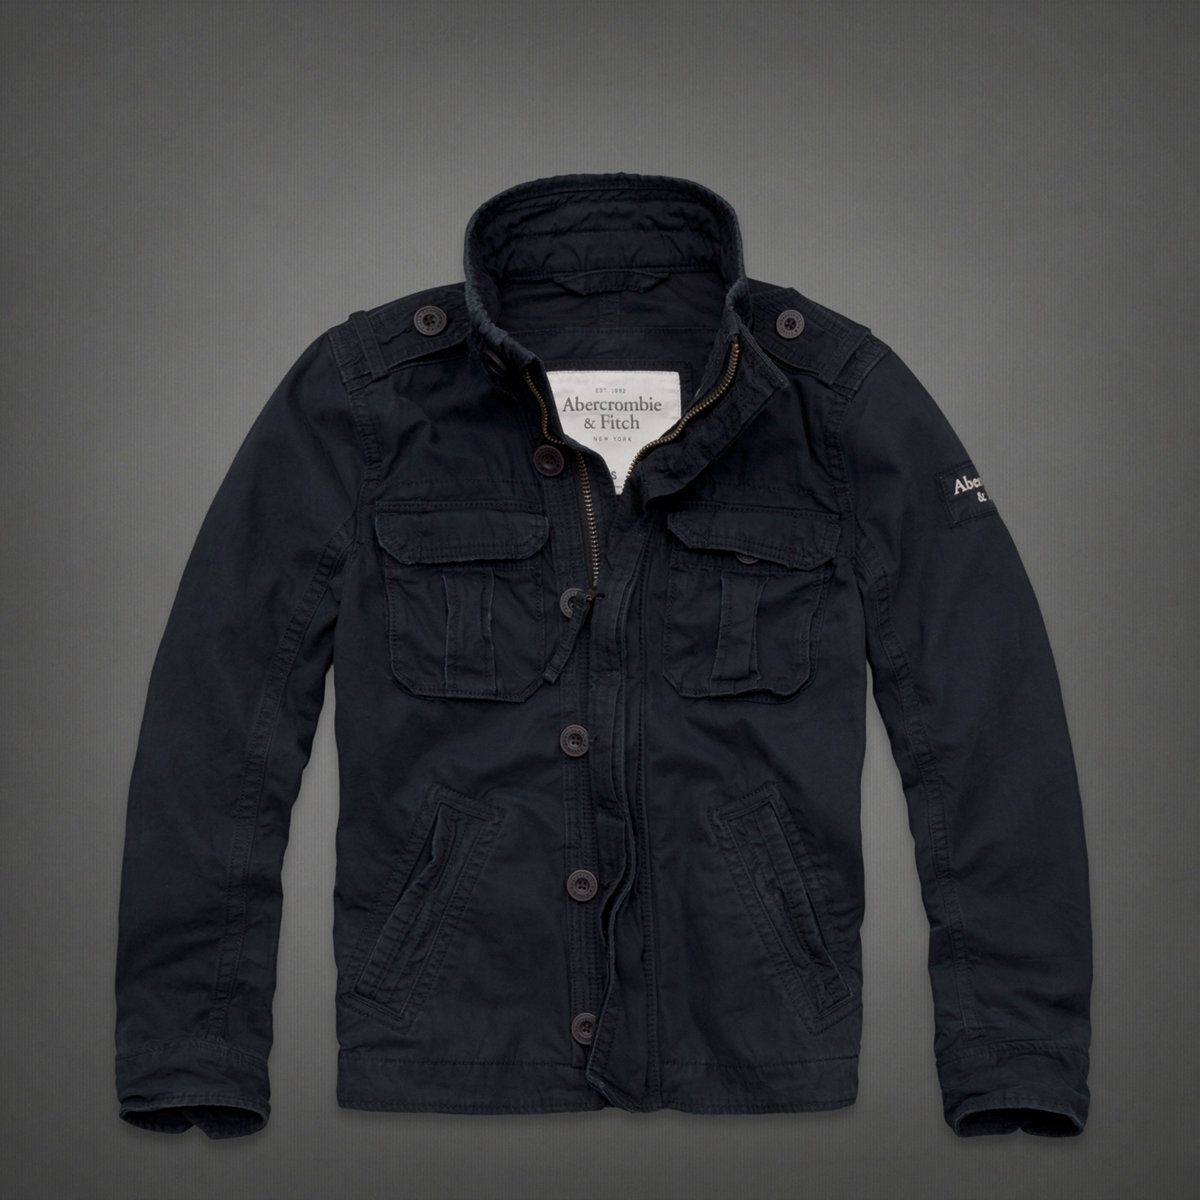 Mens Blue Mountain Jacket Mens Outerwear Abercrombie Co Uk Jackets Men S Coats Jackets Mountain Jacket [ 1200 x 1200 Pixel ]